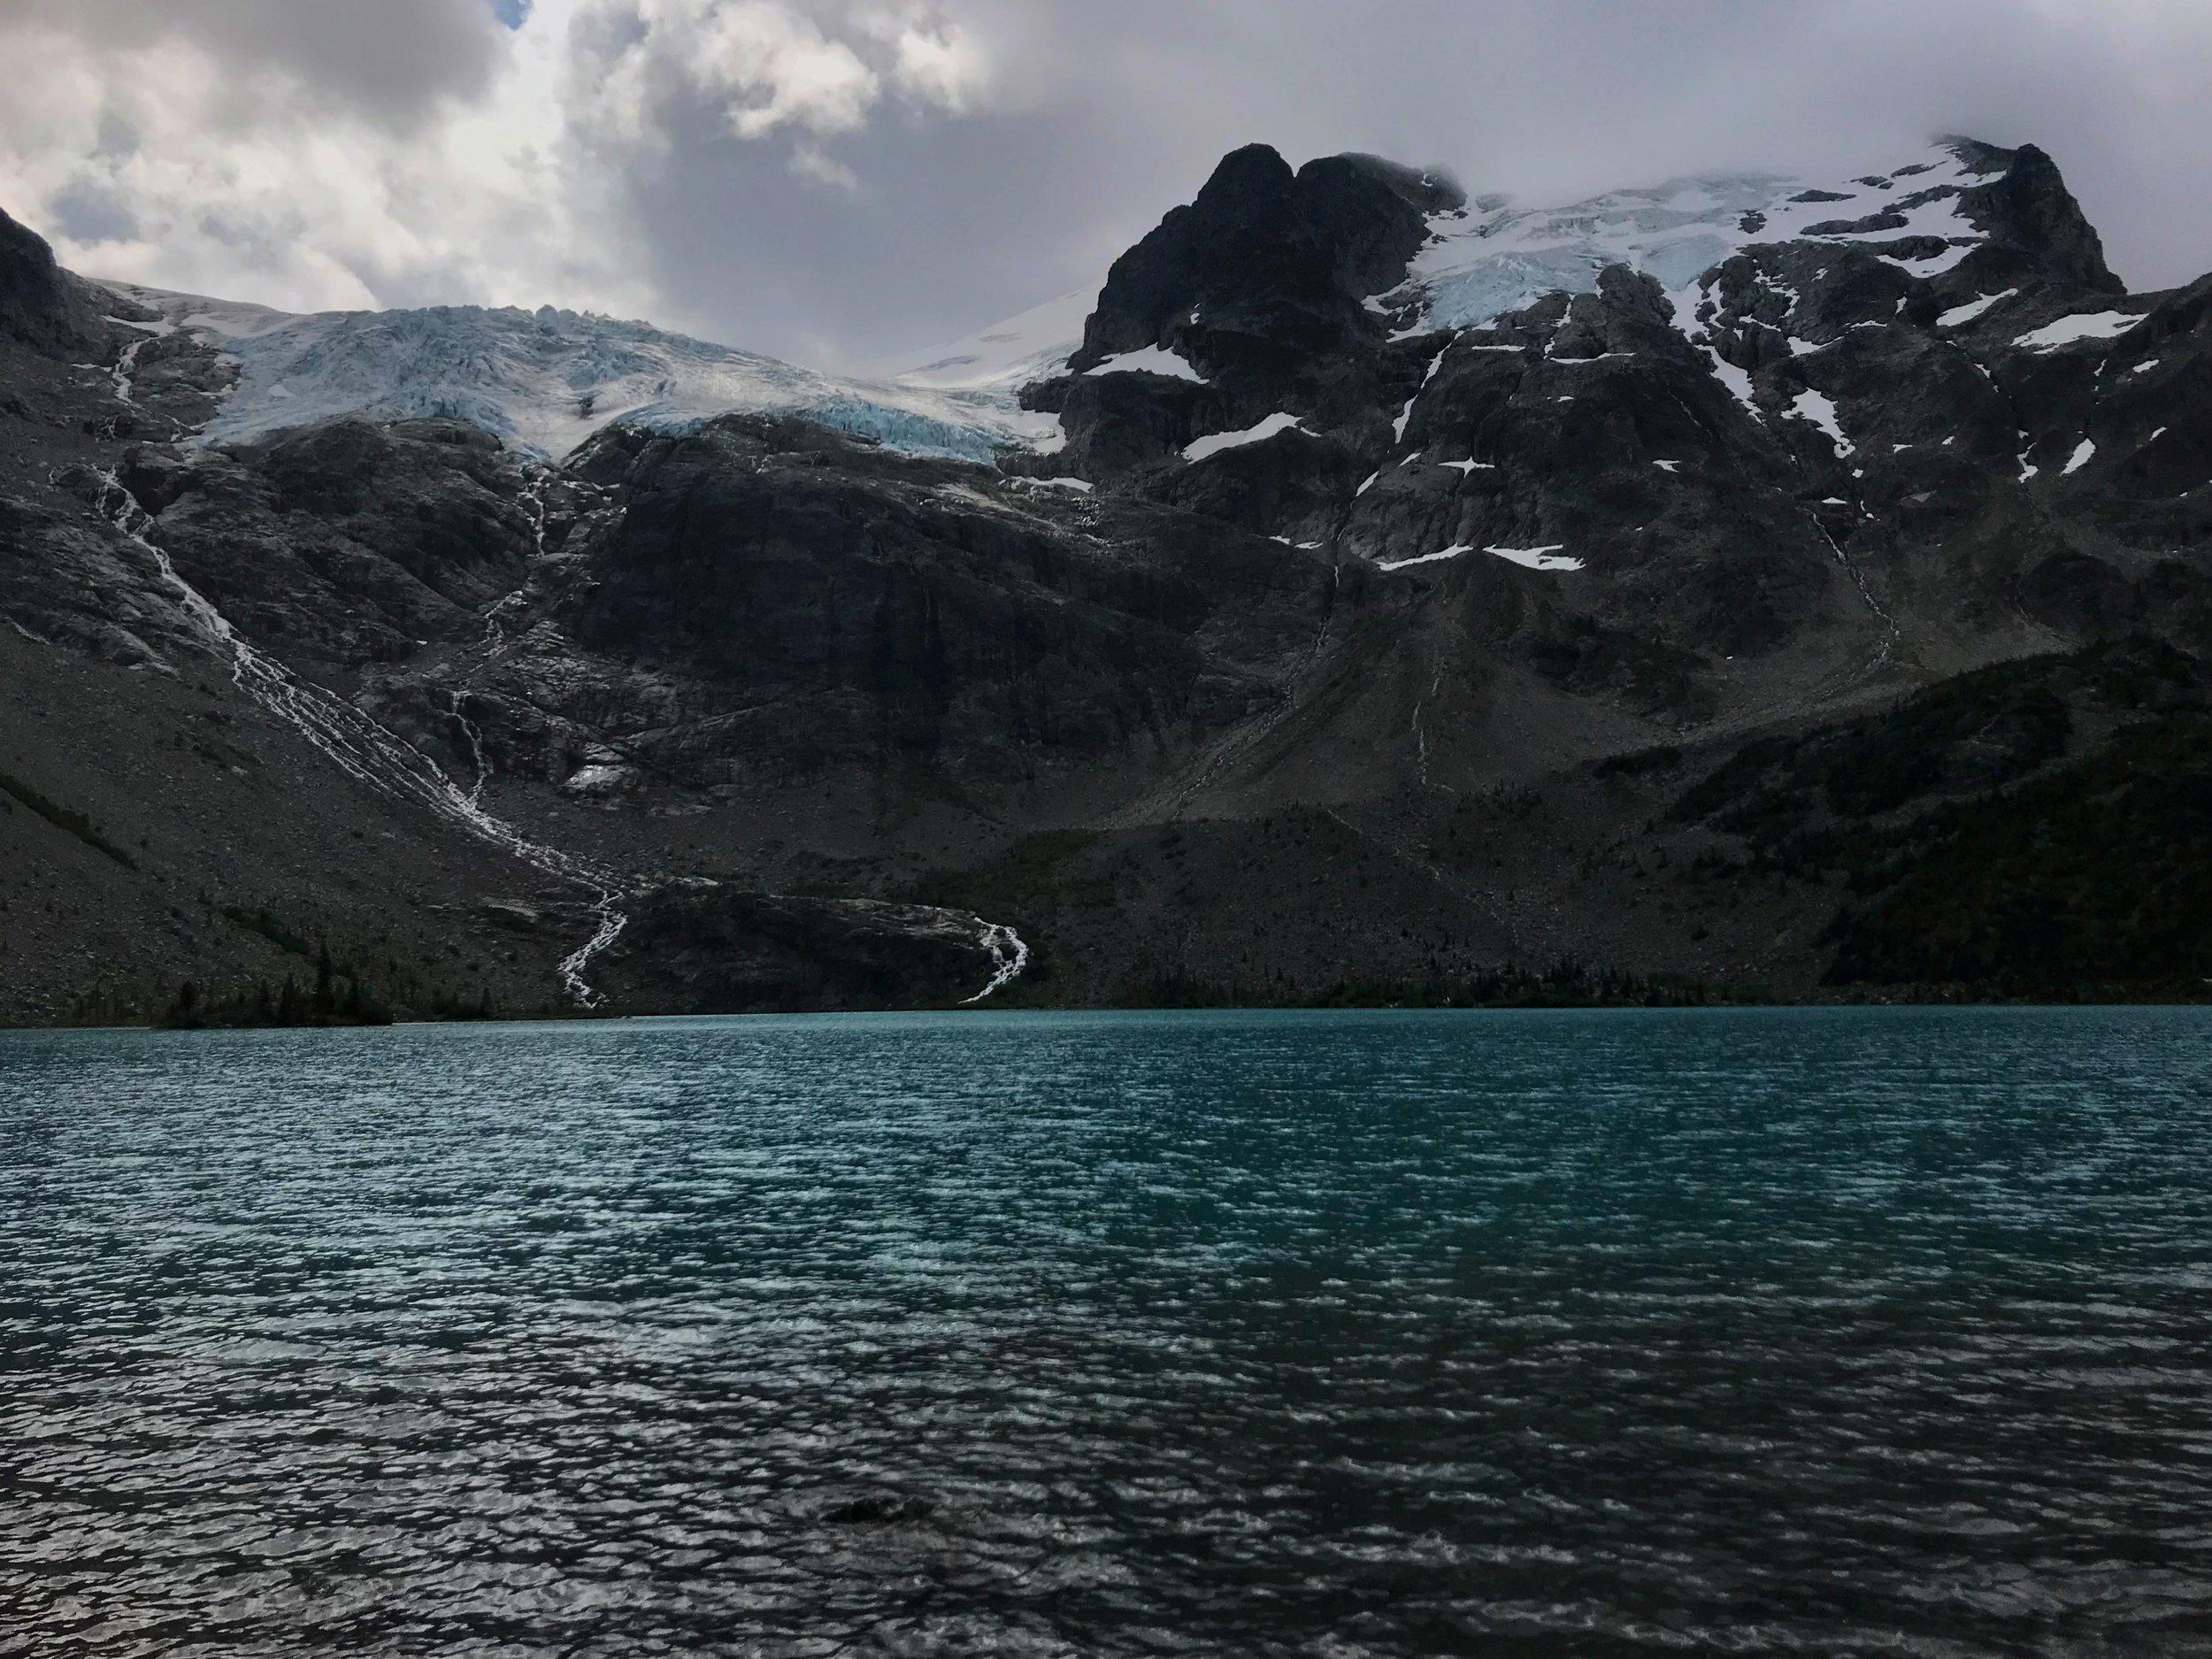 The Matier Glacier hanging above Upper Joffre Lake in Joffre Lakes Provincial Park near Pemberton, British Columbia